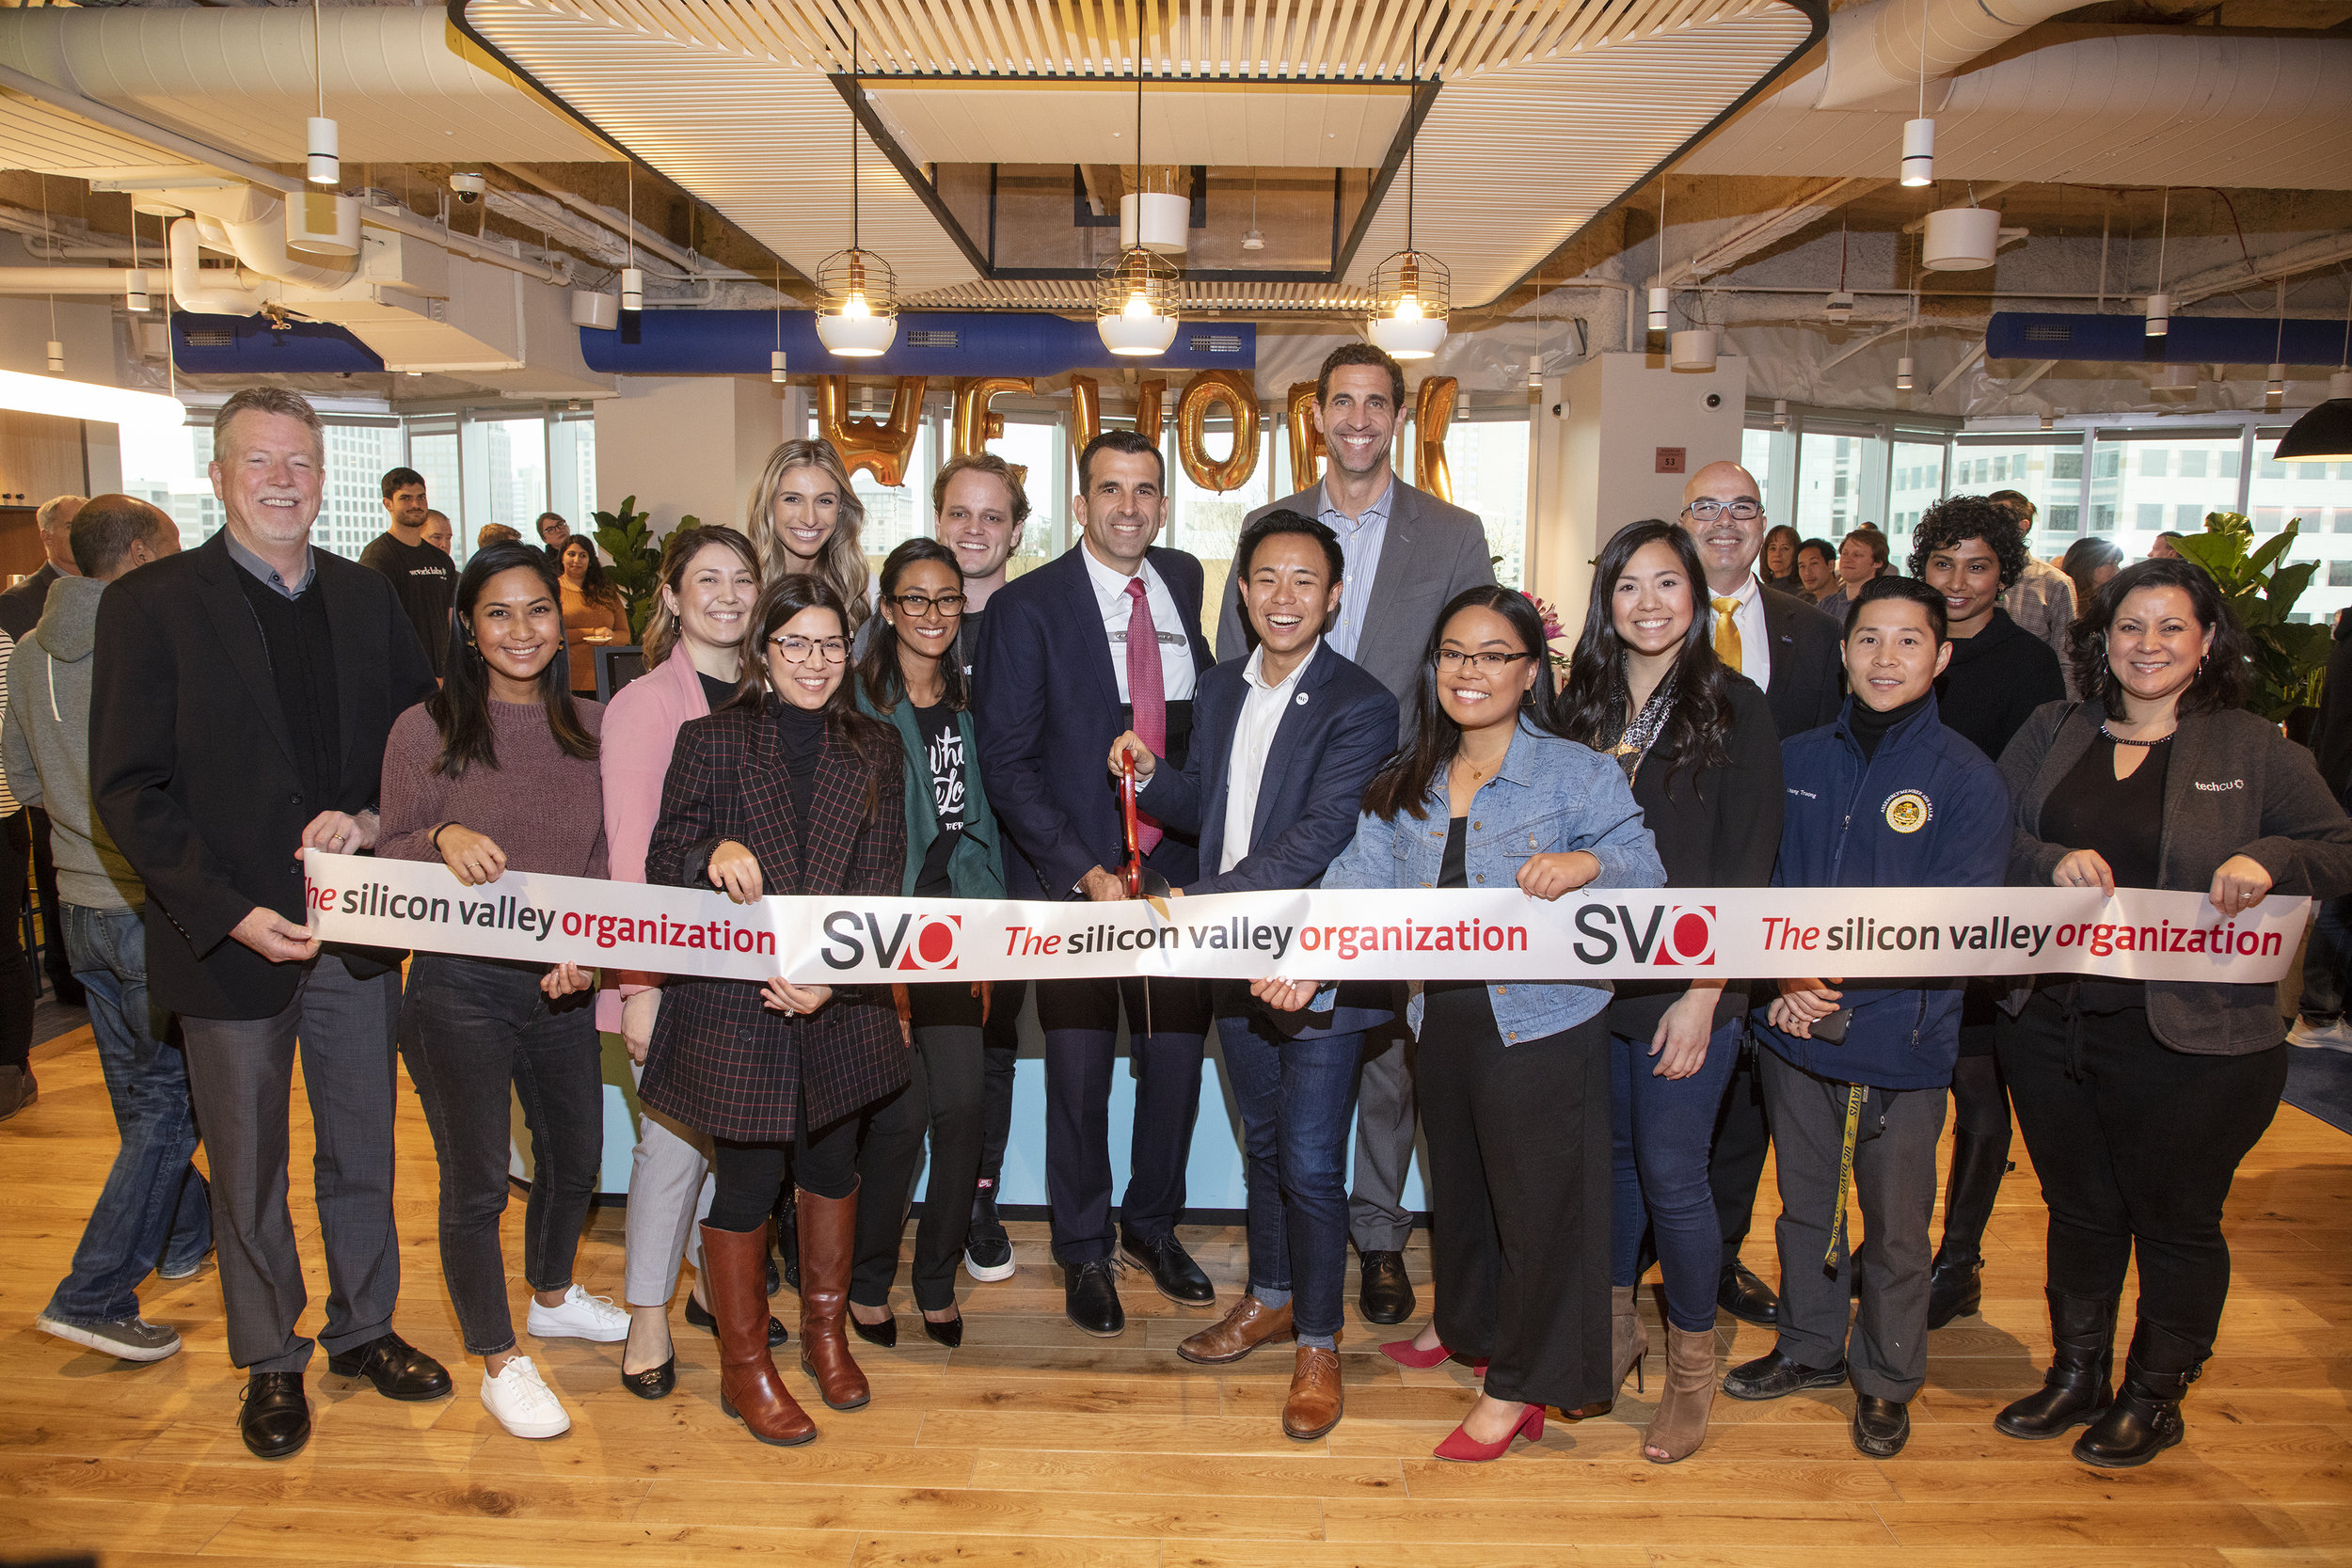 Program designed to foster start-ups, disadvantaged entrepreneurs and non-profits